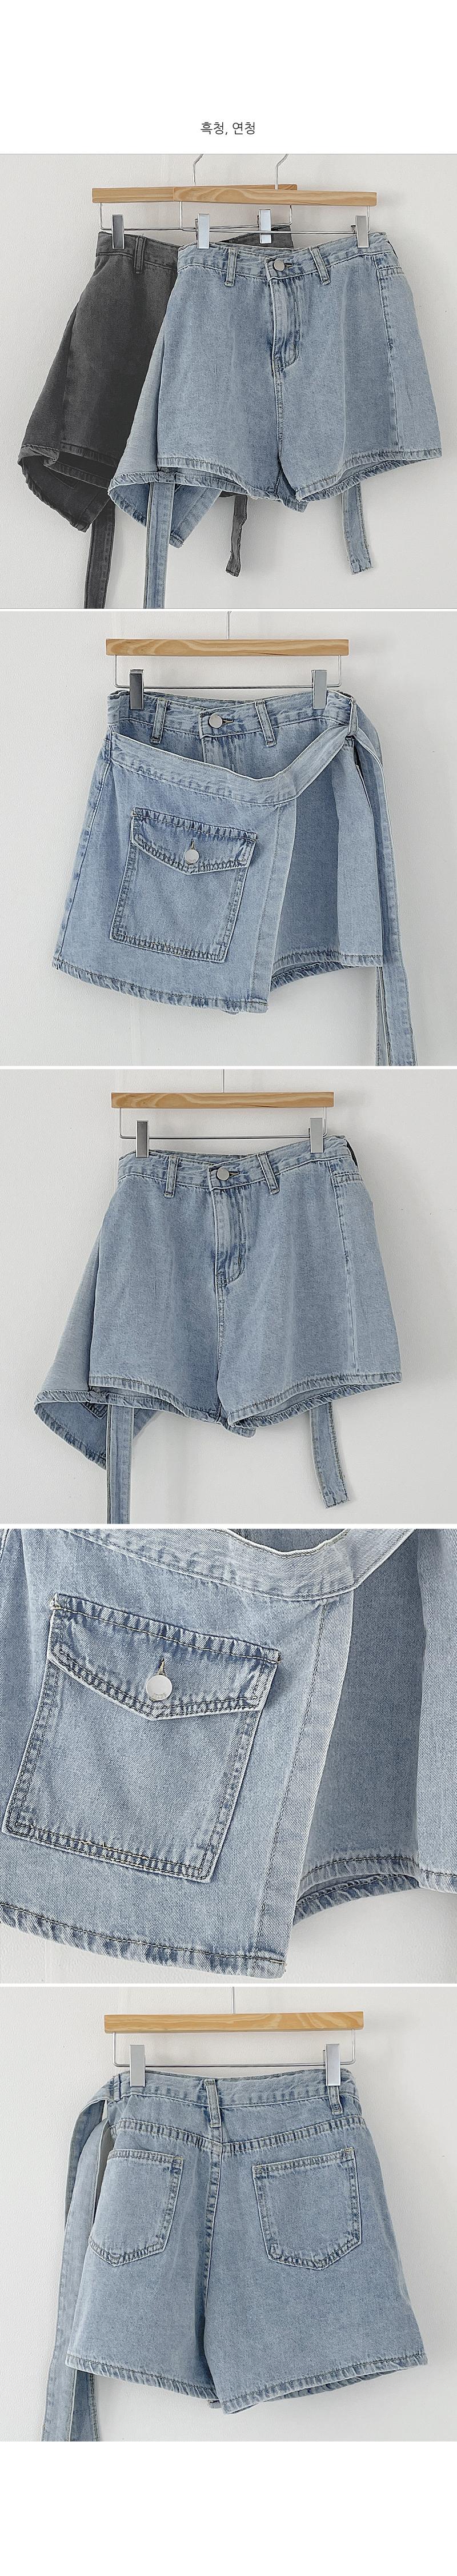 How Wrap Denim Skirts